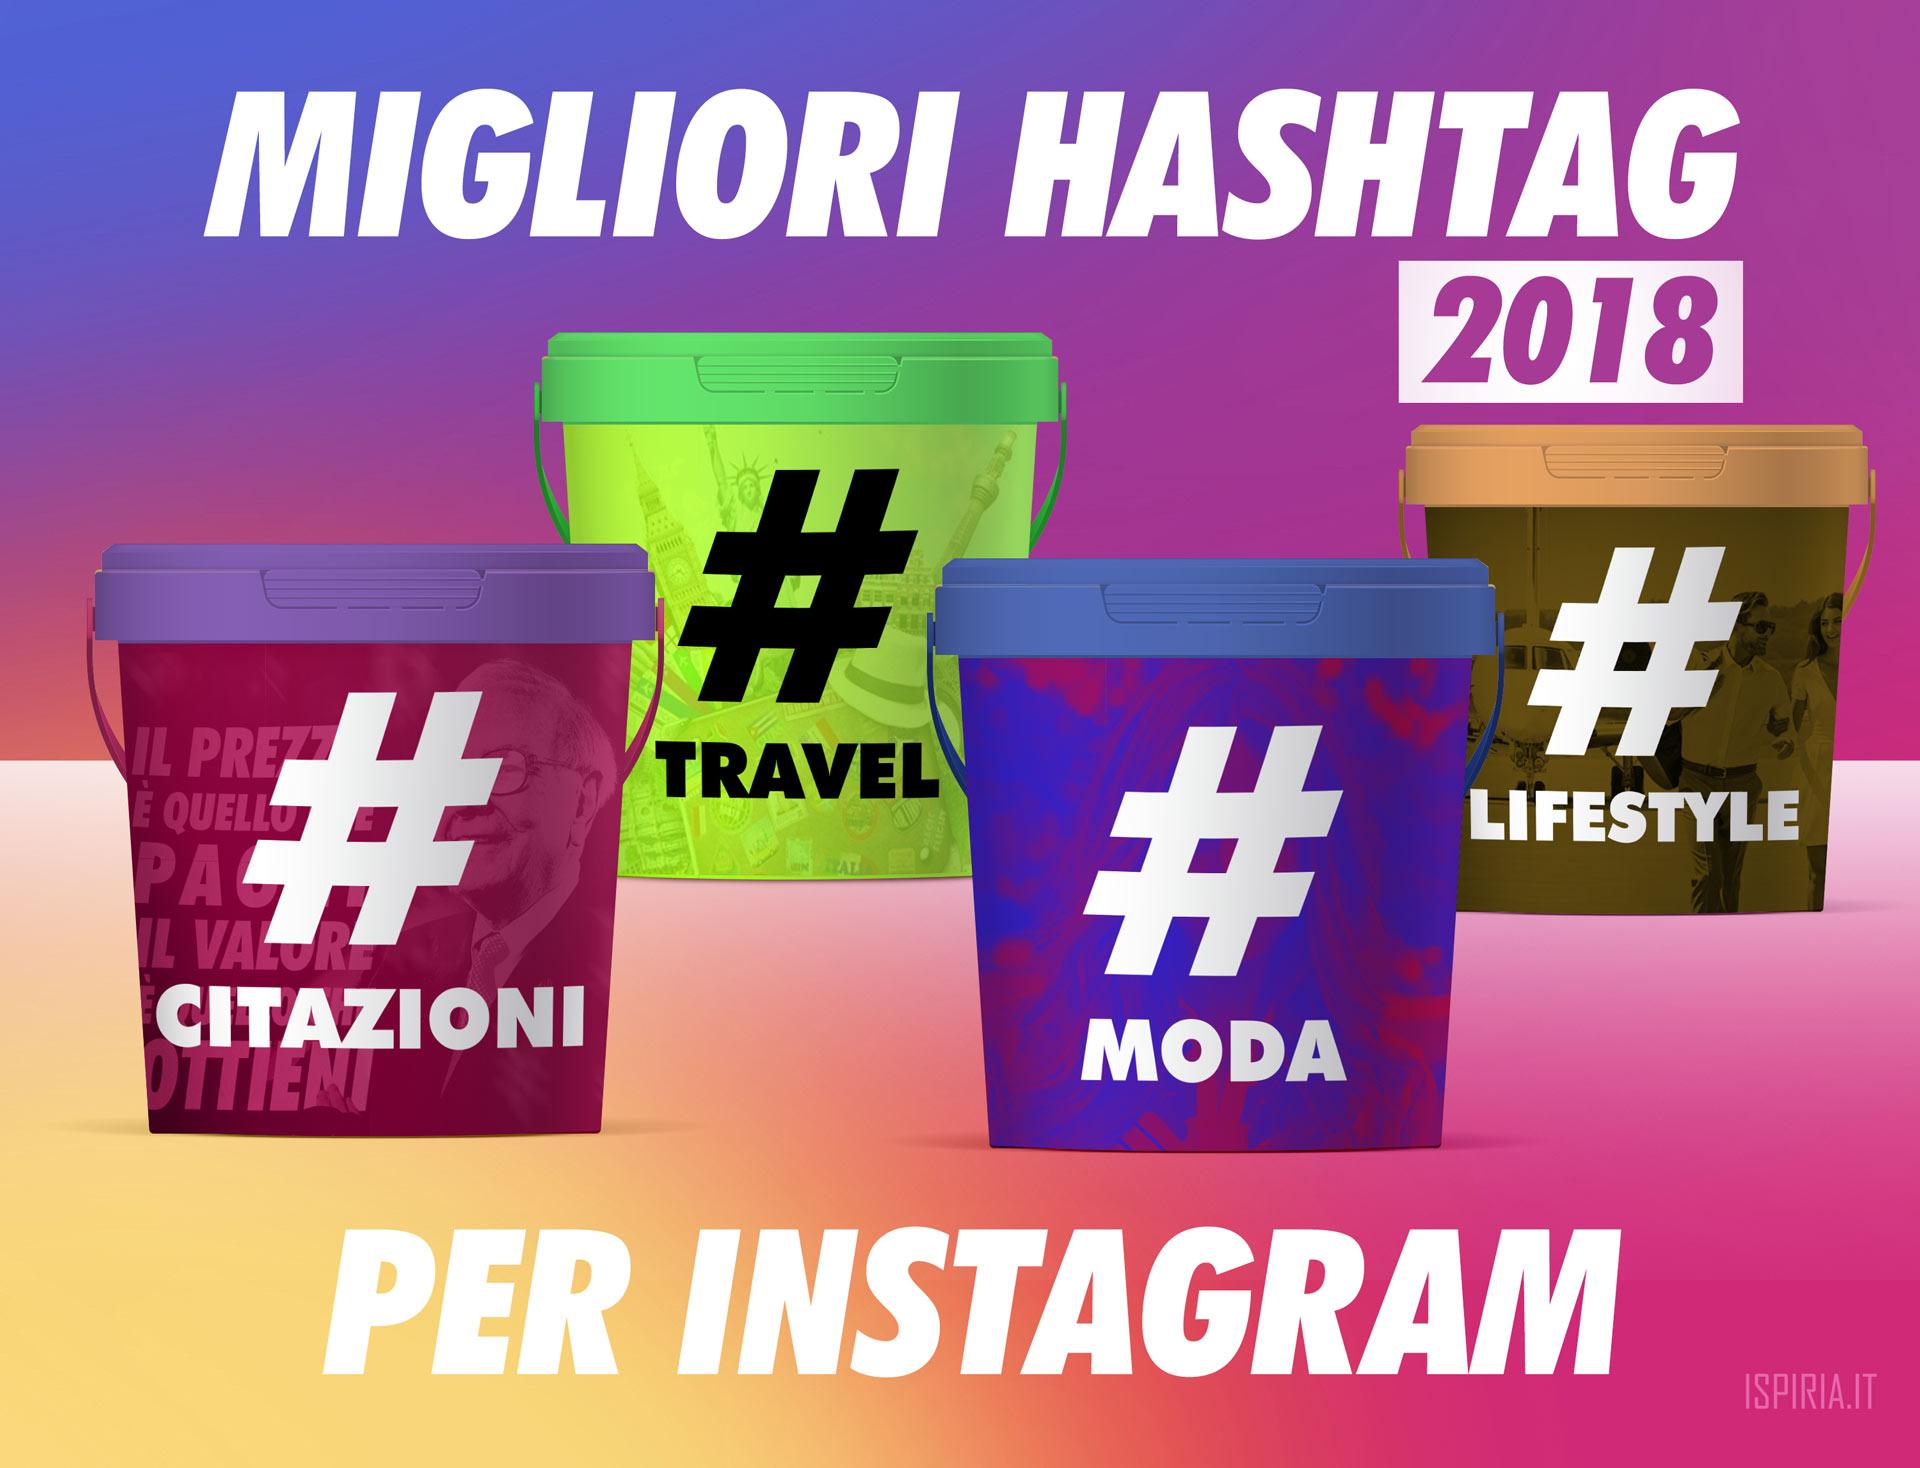 Migliori Hashtag Instagram Luglio 2018 Divisi Per Settore